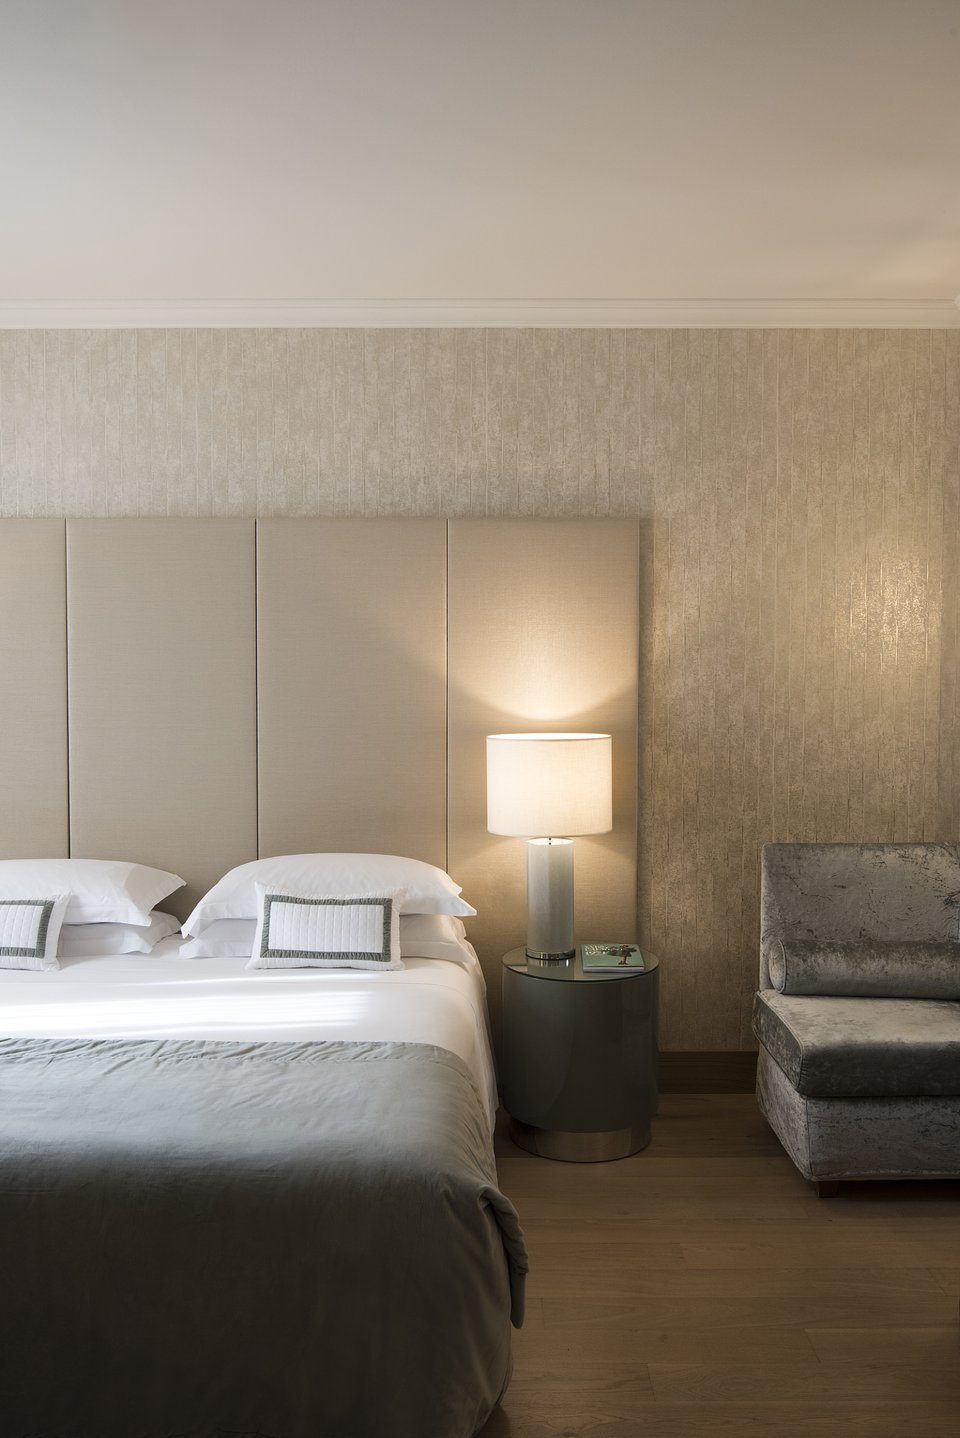 Starhotels Rosa Grand_Mi_Deluxe by Andrea Auletta (3).jpg